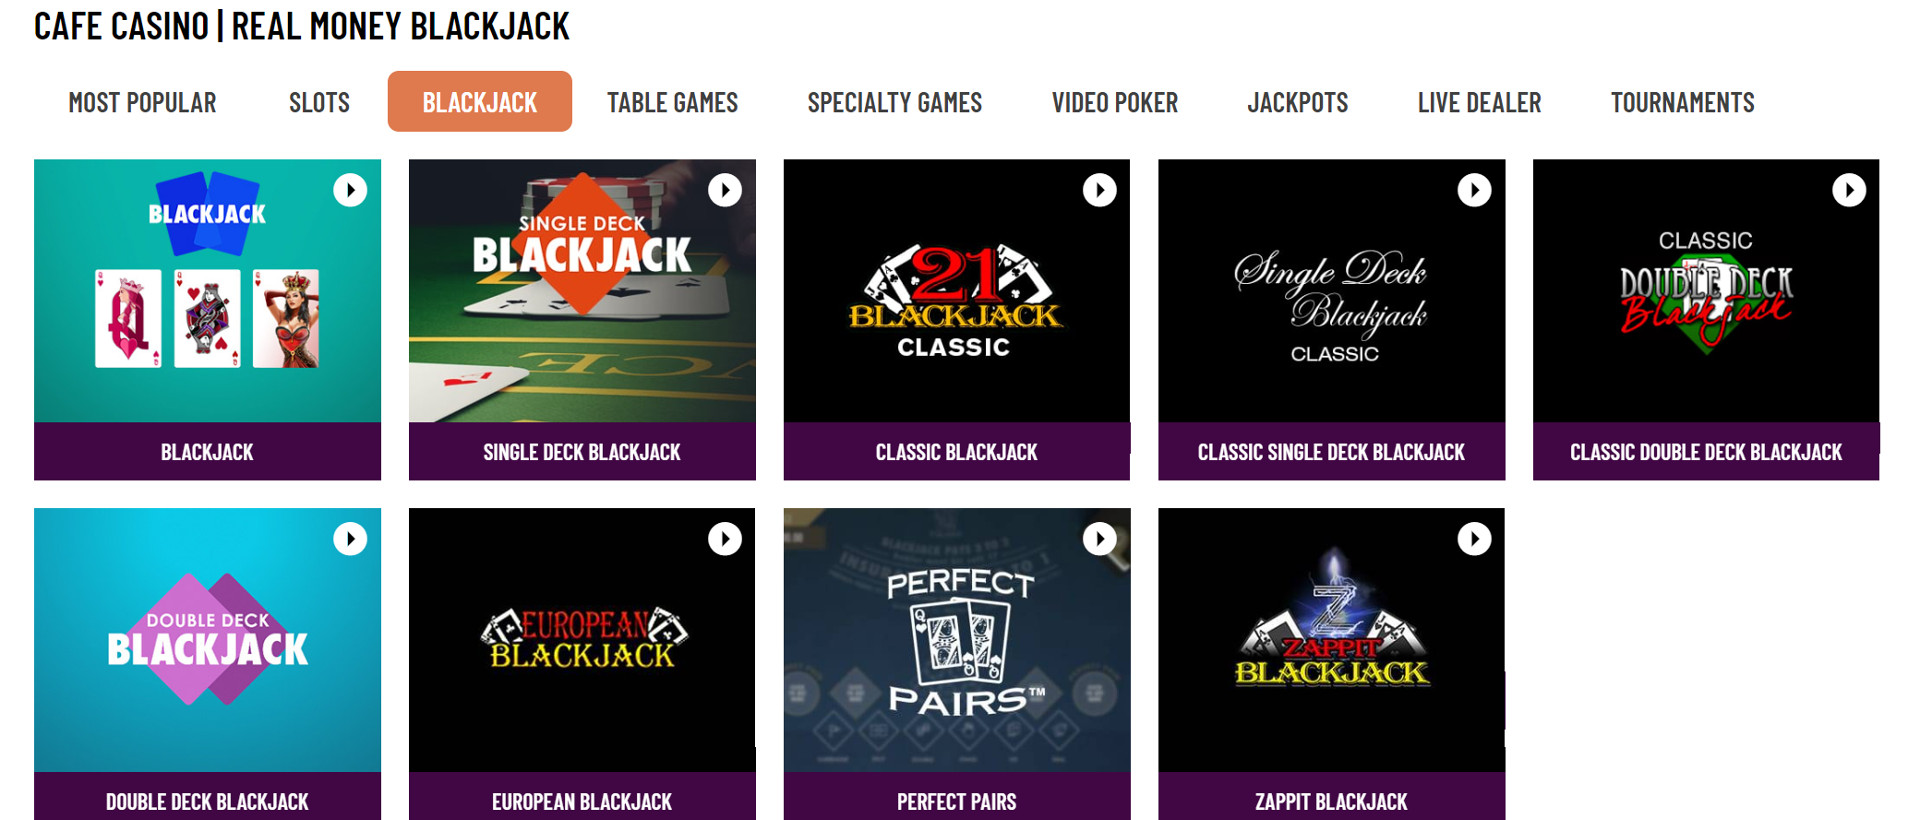 Cafecasino Promo Codes 6 Bonuses August 2020 Sportsbook Promotion Codes